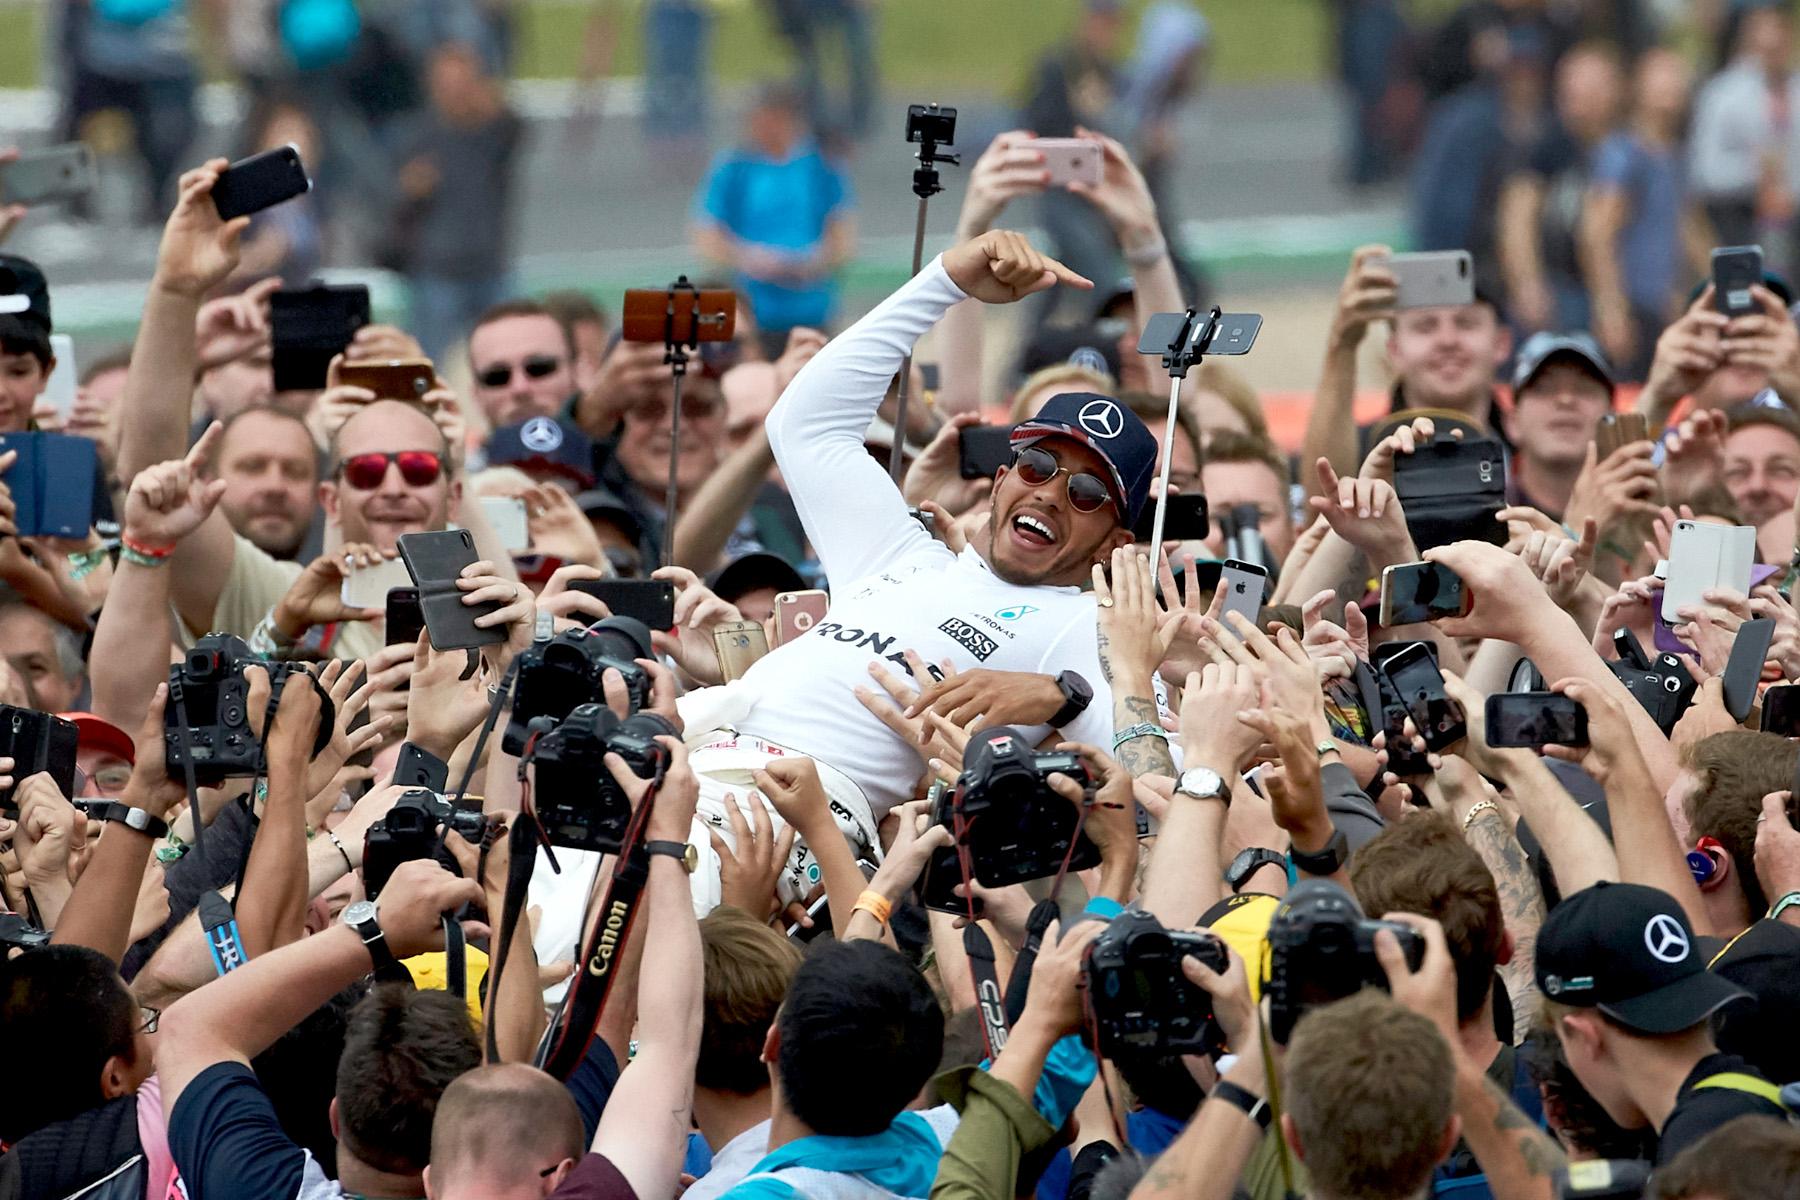 Lewis Hamilton surfs the crowd afeer winning the 2017 British Grand Prix.